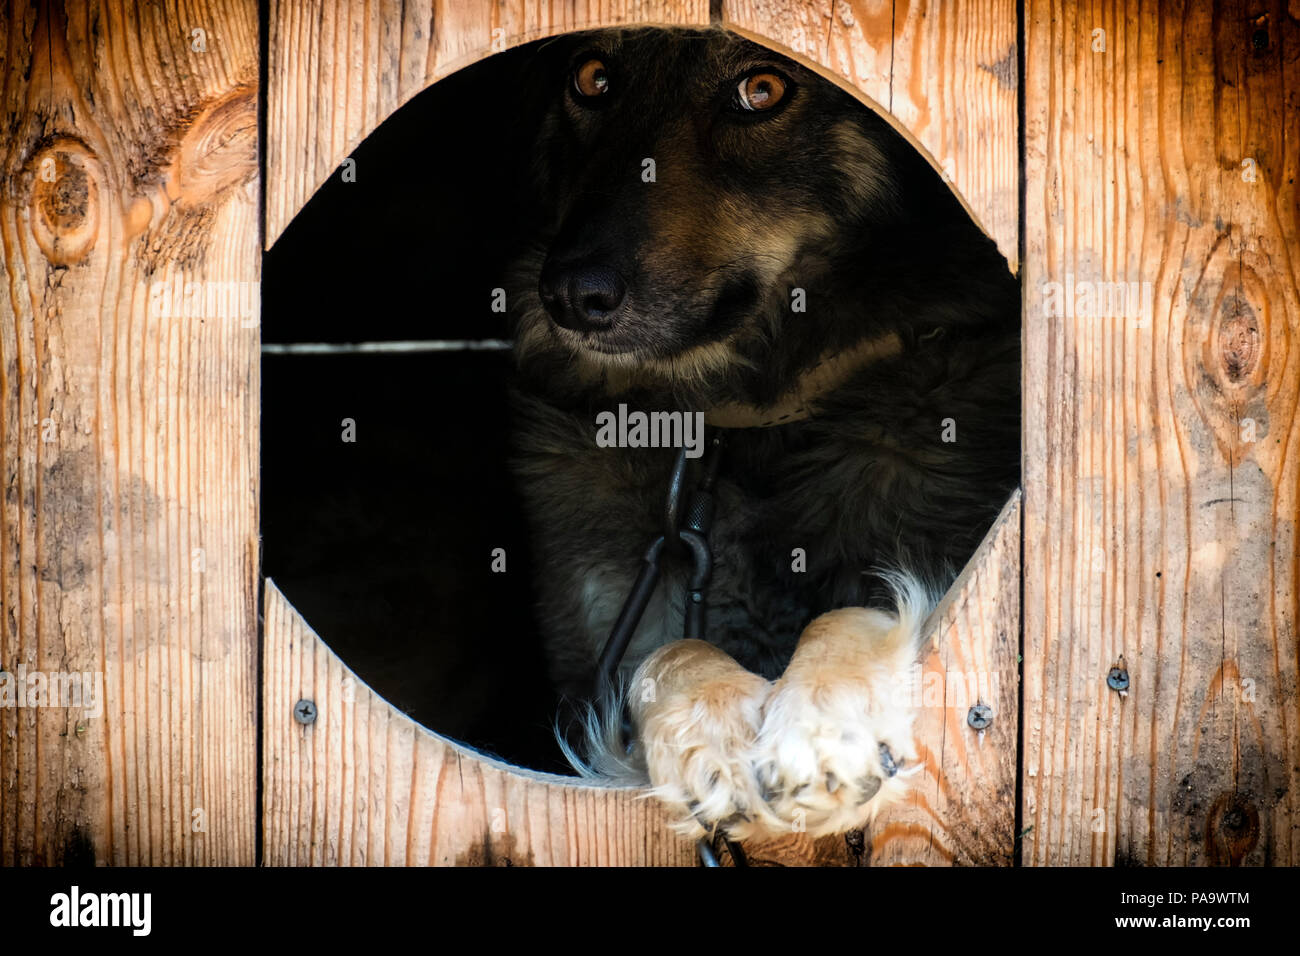 Kette Hund geheimnisvoll Blicke aus dem Kennel Stockbild